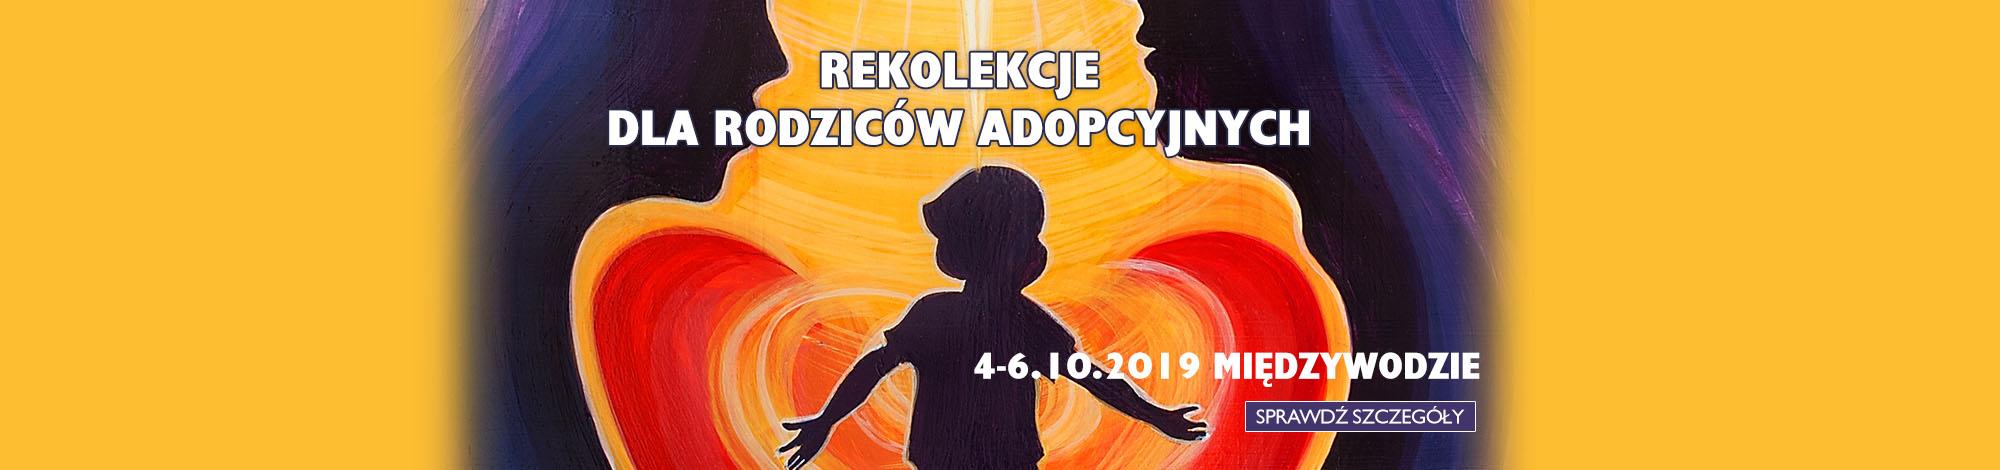 slide_adopcja_2019